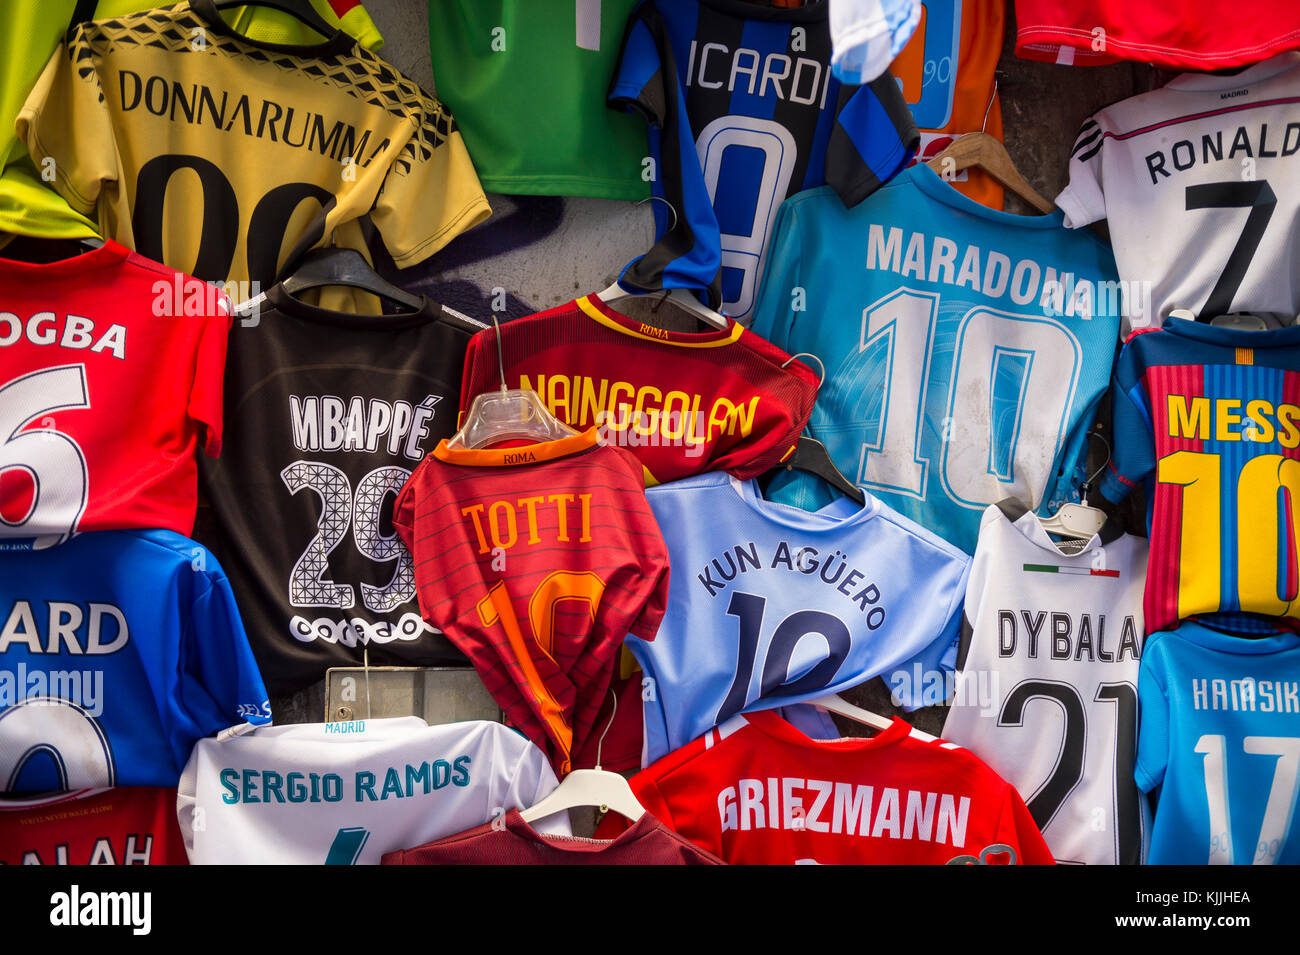 Football Shirts Market Stall Imágenes De Stock   Football Shirts ... 958f2b49a1760